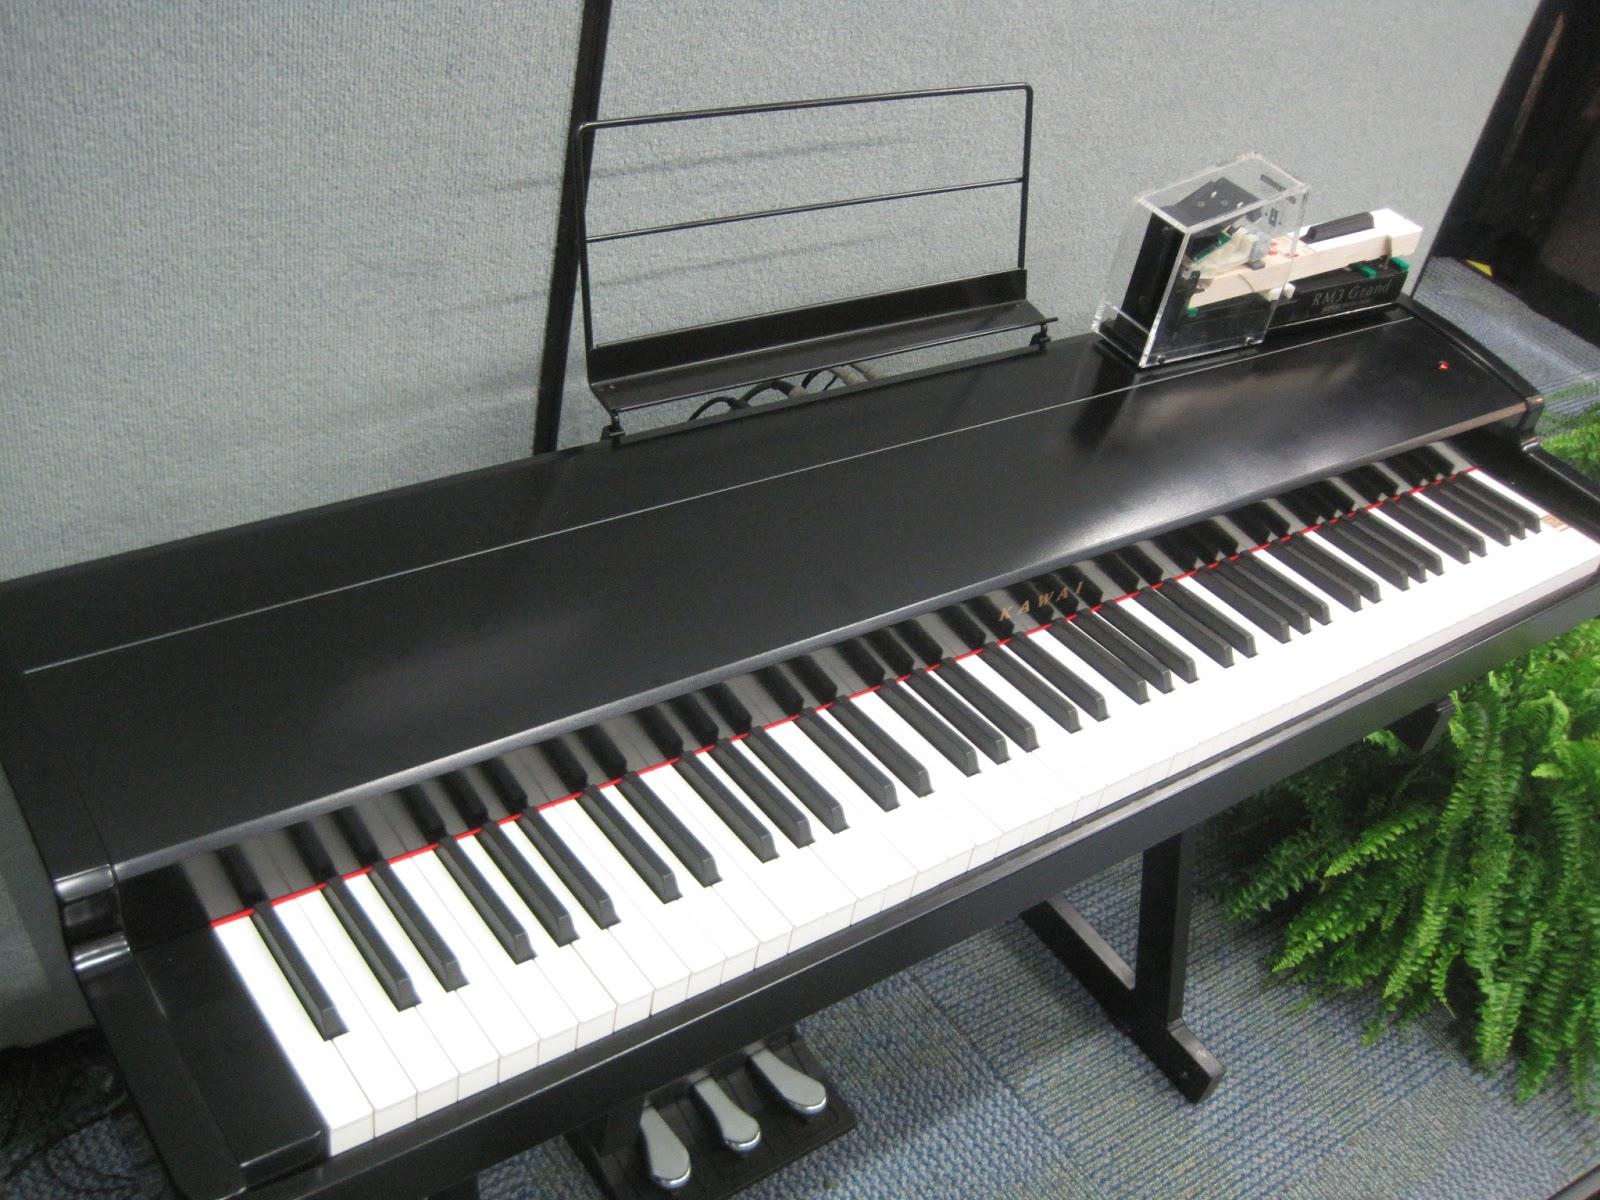 Az piano reviews review kawai vpc1 piano controller for Yamaha digital piano controller